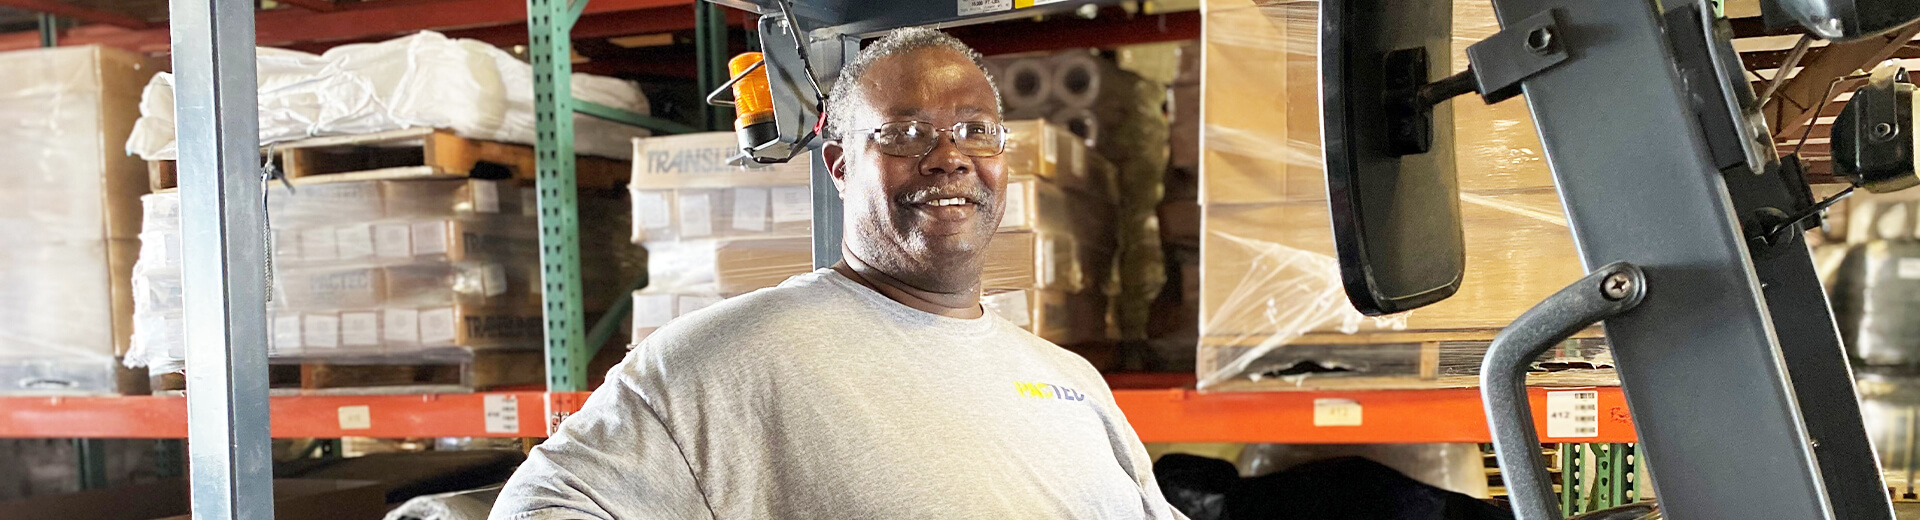 PacTecs Shipping and Receiving Warehouseman - Charles Fisher